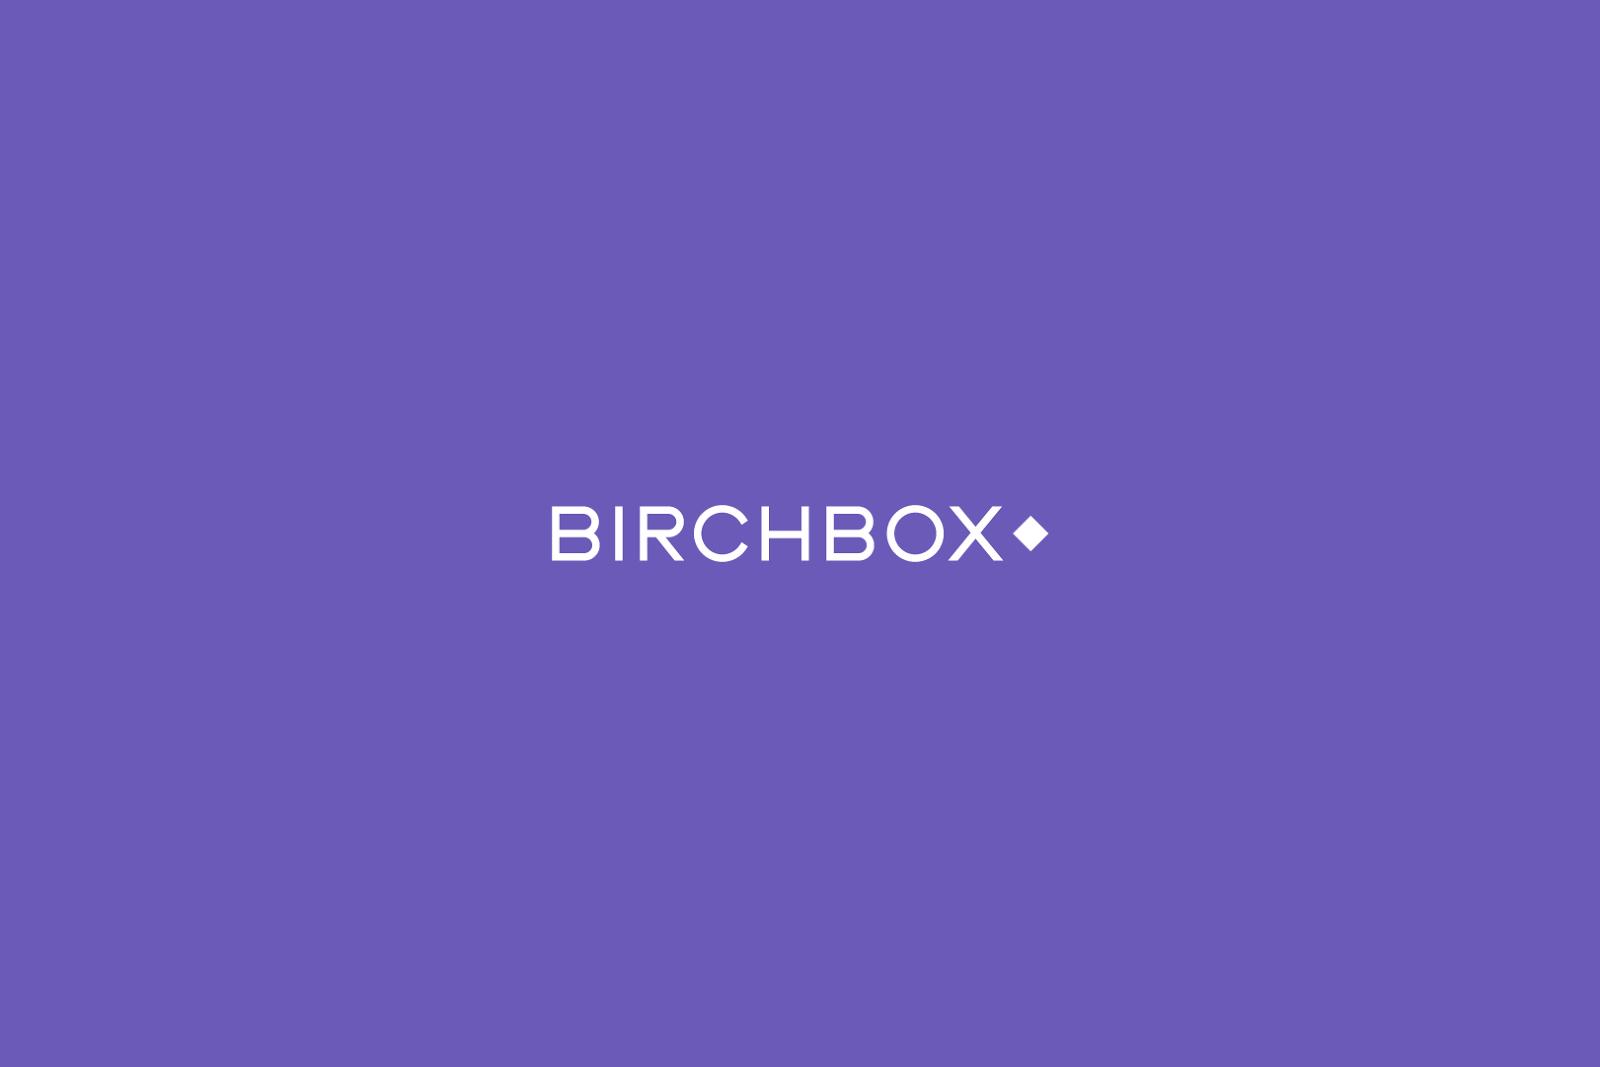 Birchbox_2015-09_1600_c